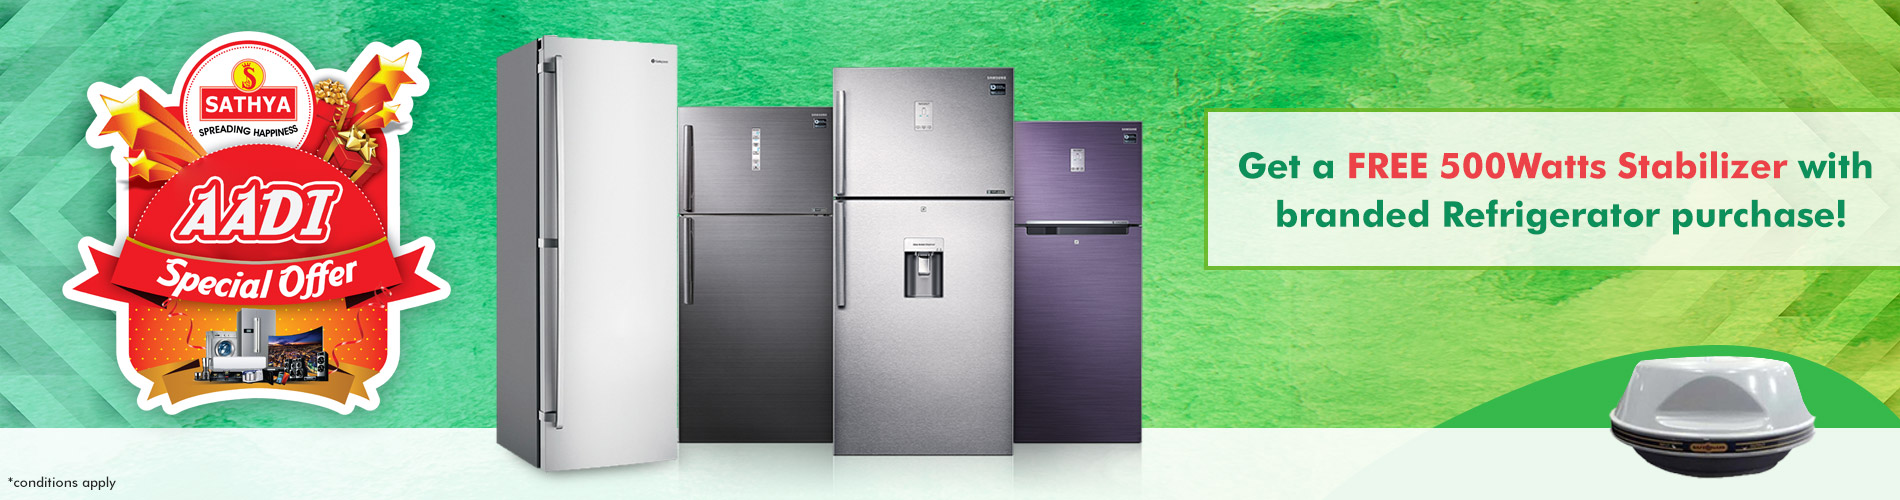 056731c37dd Refrigerator - Buy Fridge online at Best Prices | SATHYA